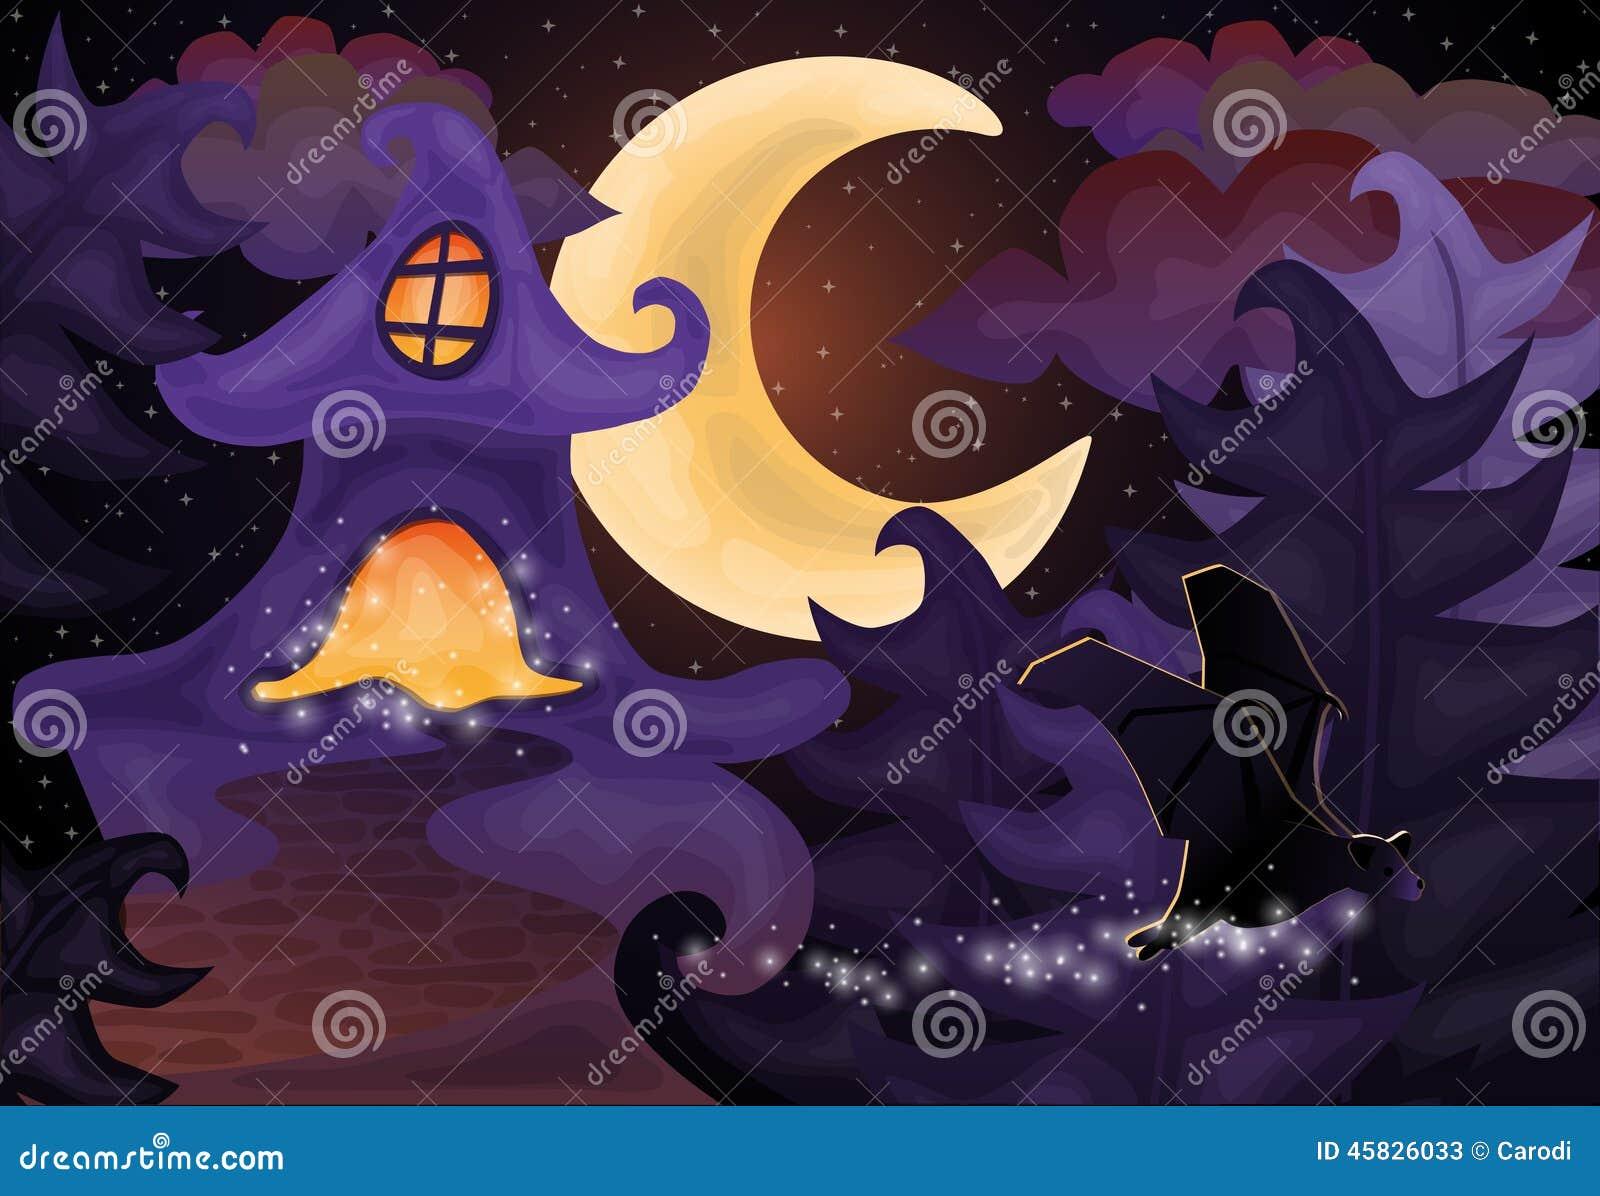 Popular Wallpaper Halloween Haunted - halloween-night-wallpaper-haunted-house-vector-illustration-45826033  Trends_72424.jpg